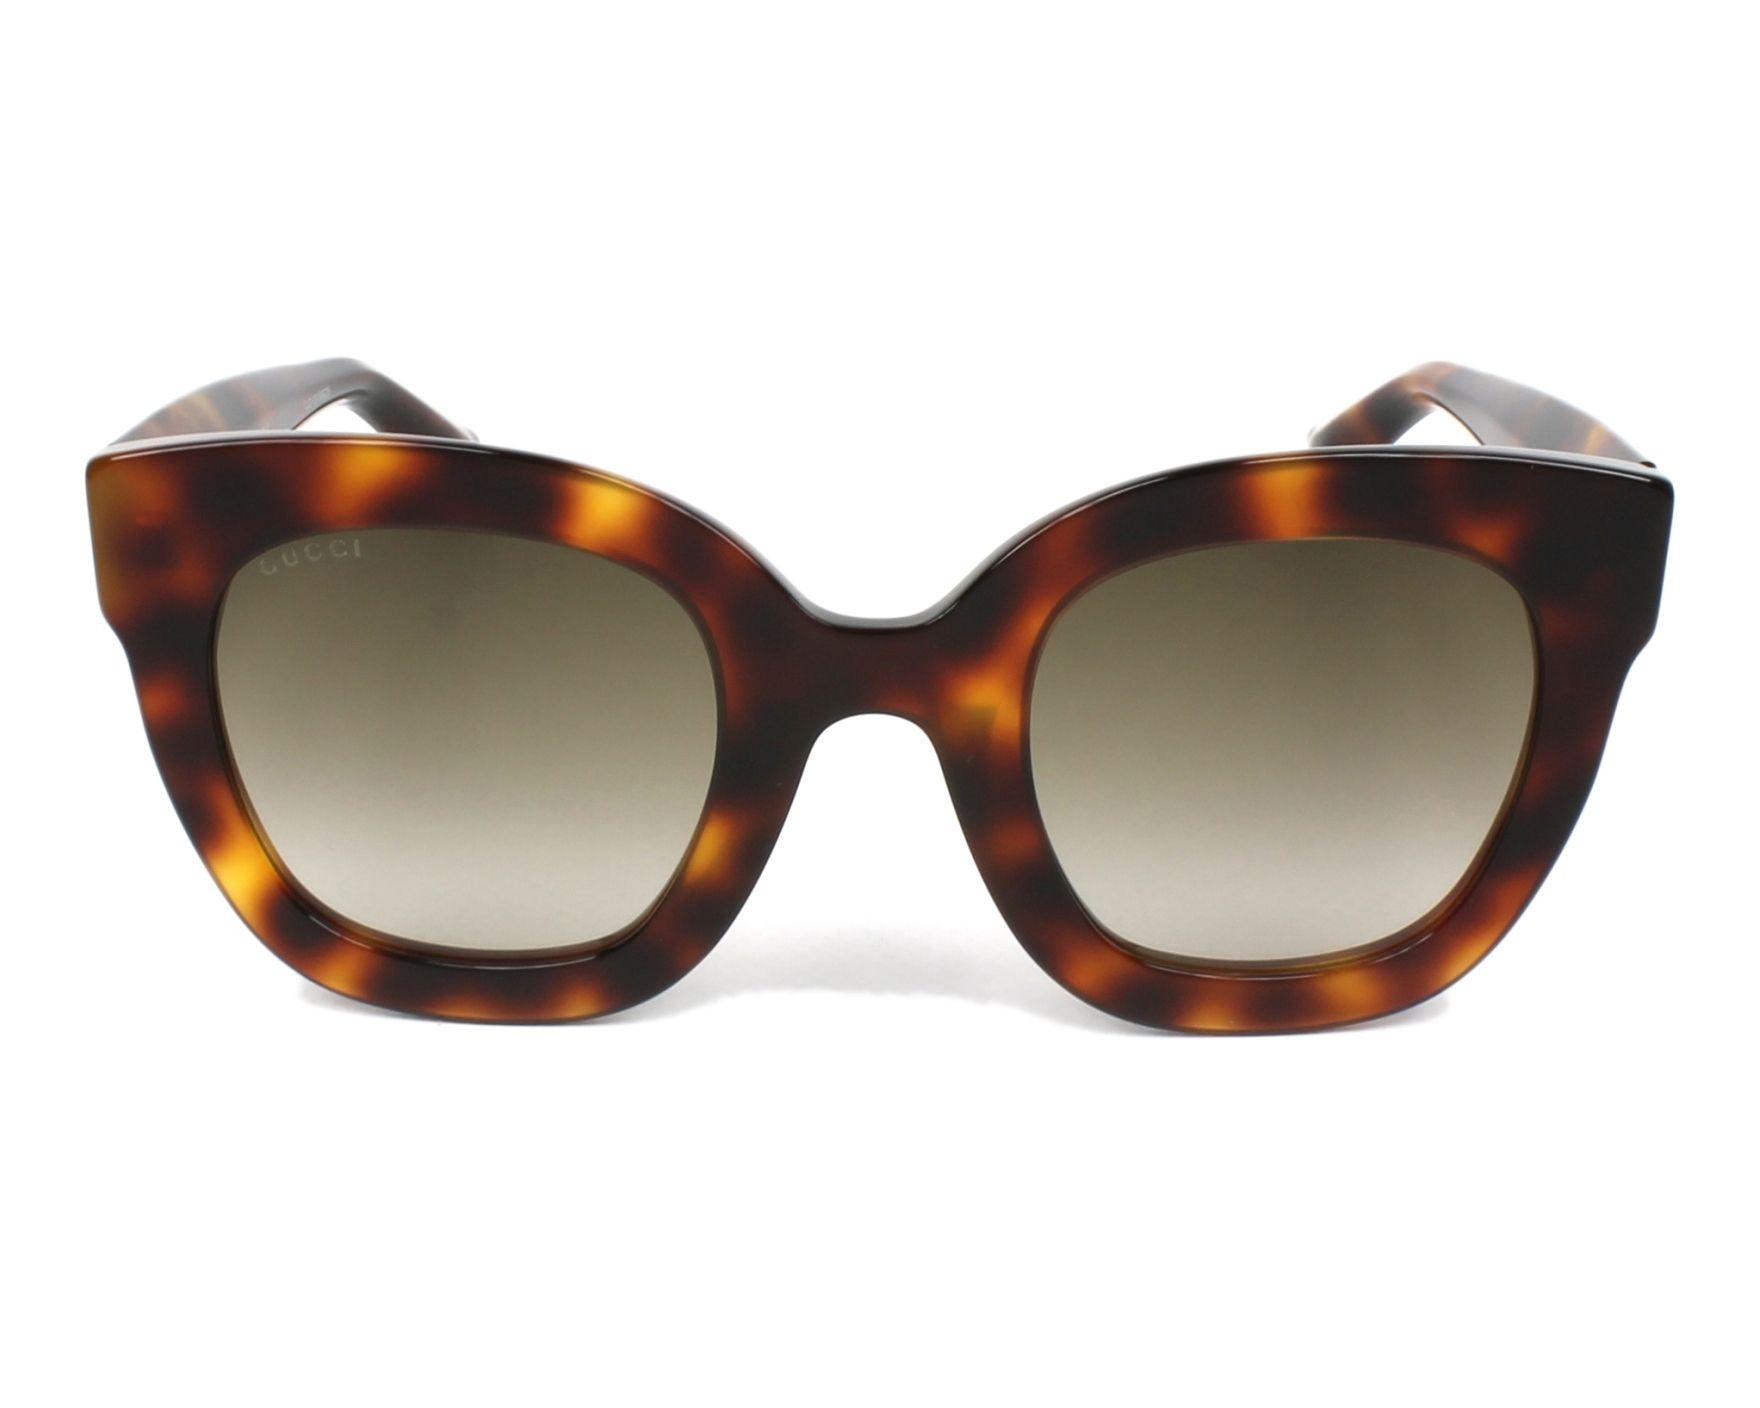 d8bacffa9f0 Sunglasses Gucci GG-0208-S 003 49-25 Havana front view